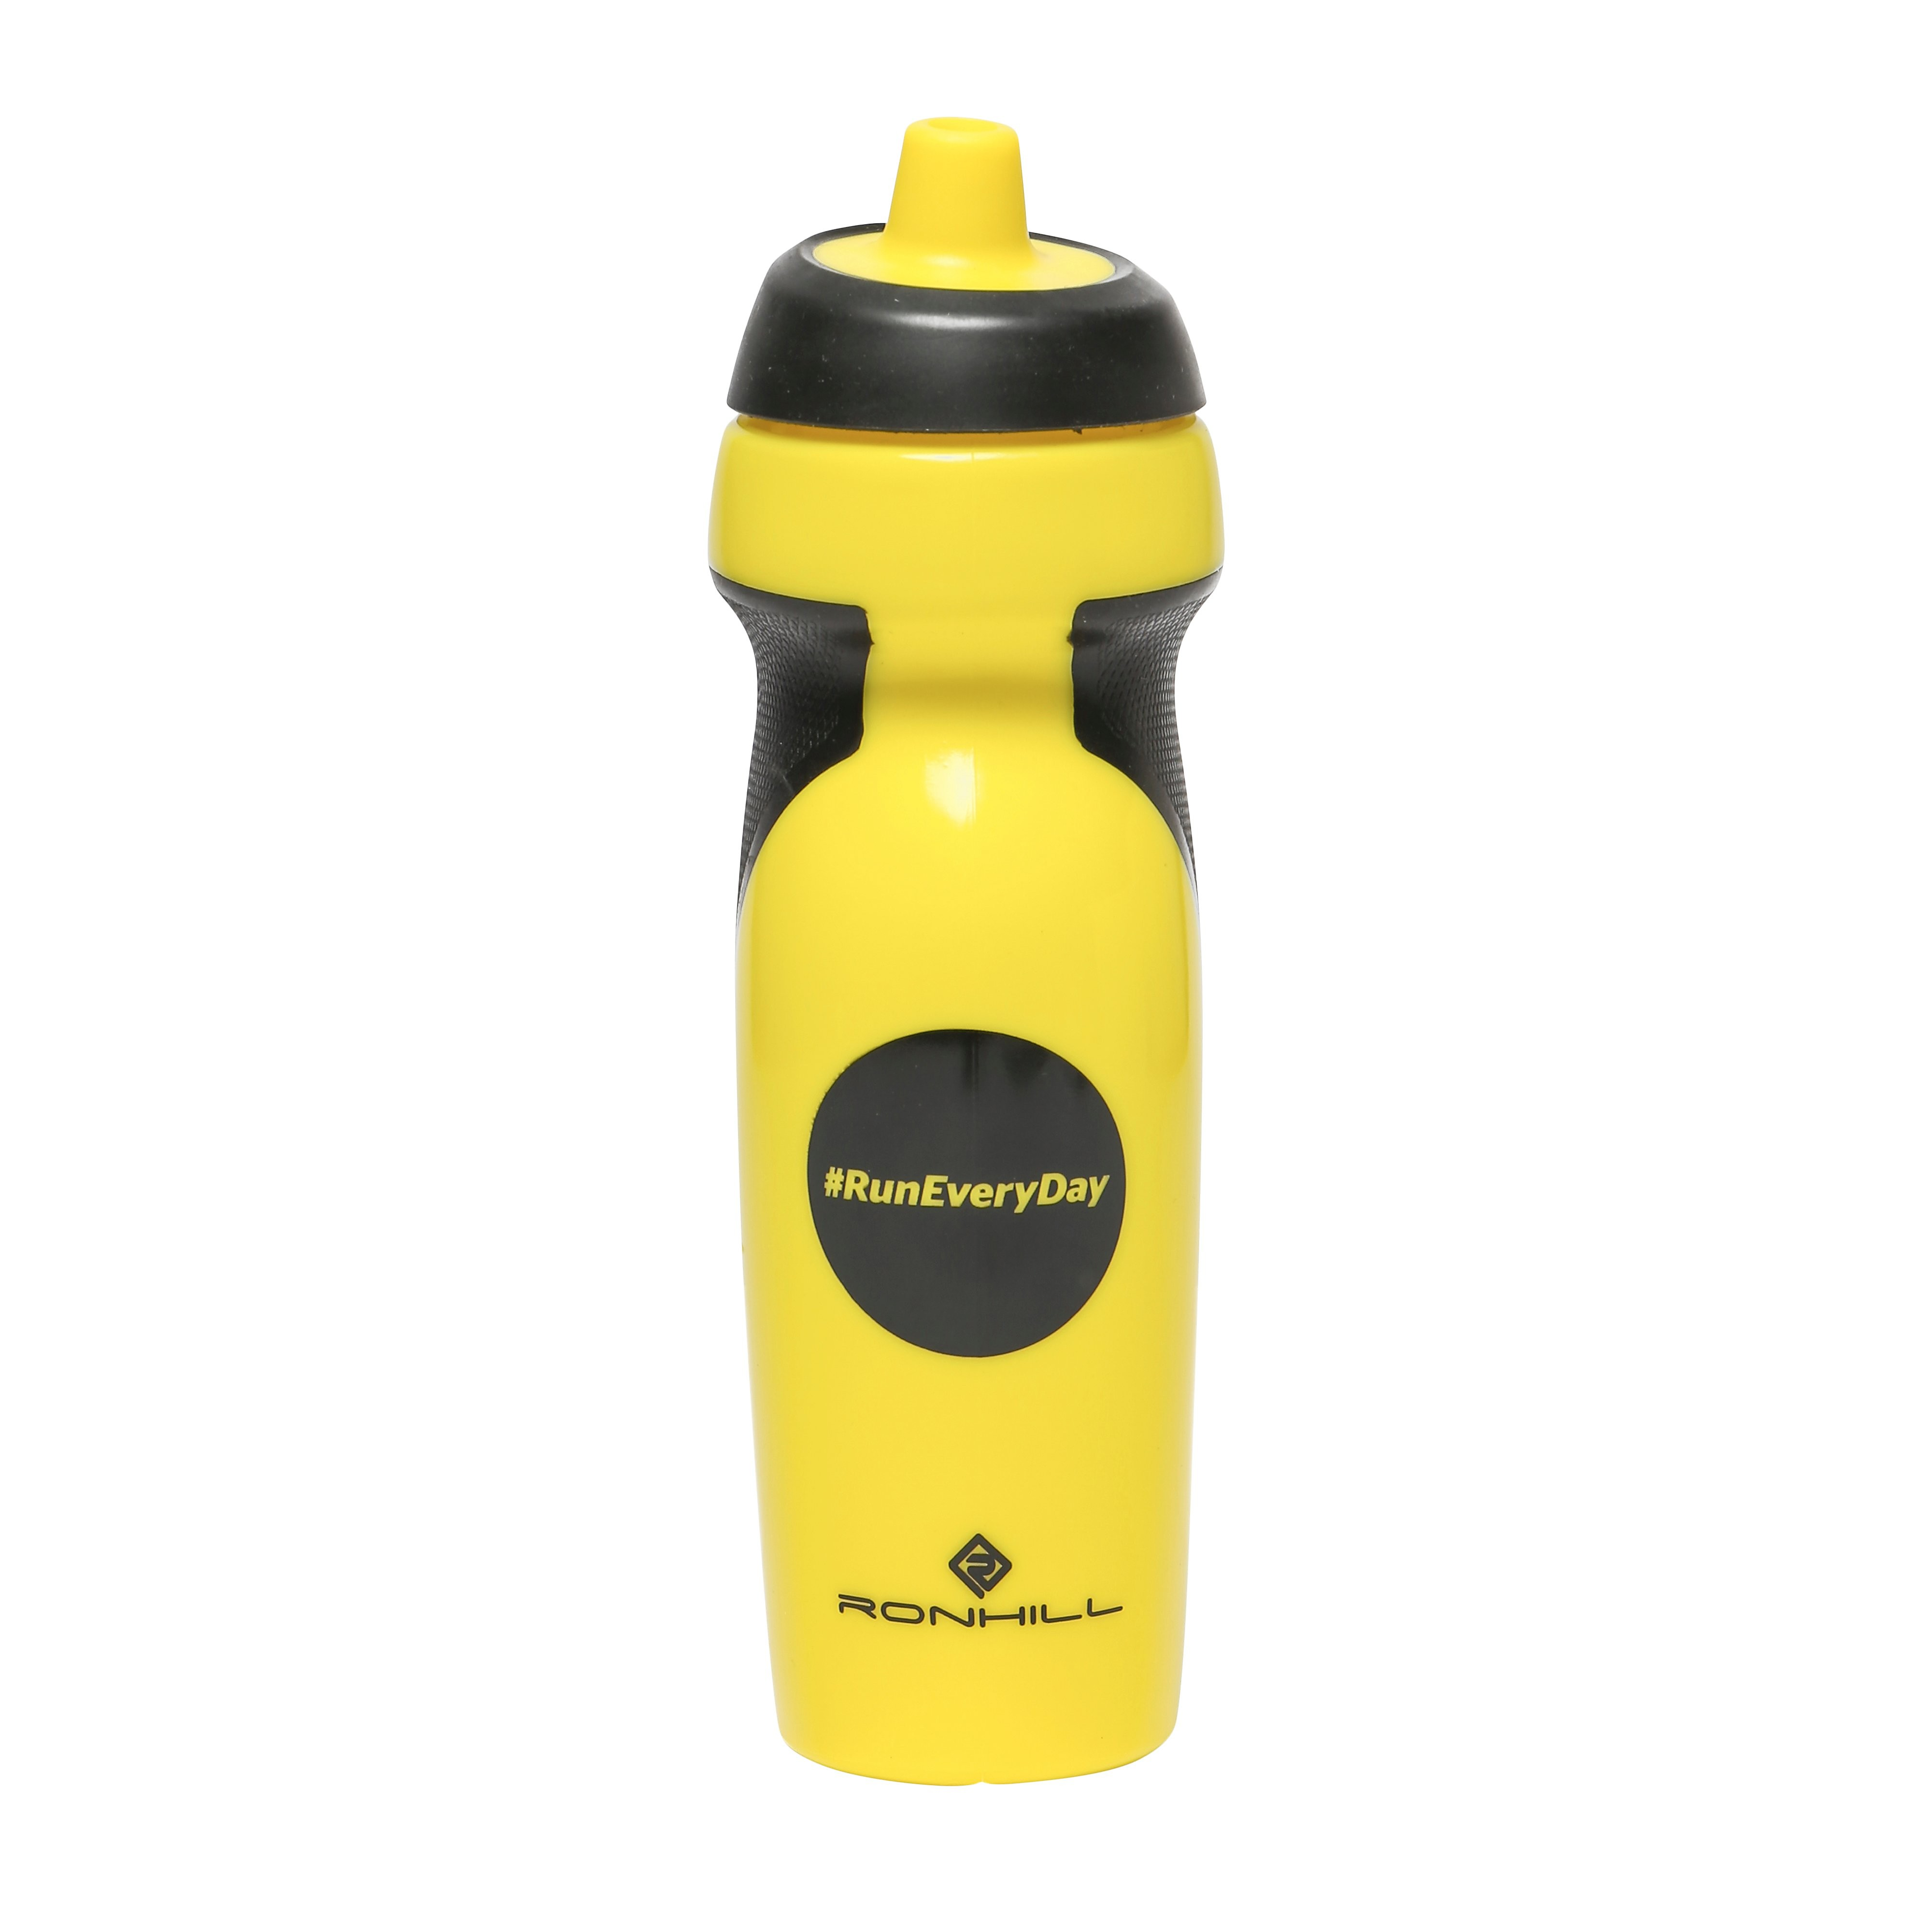 Ronhill 600ml Hydro Bottle